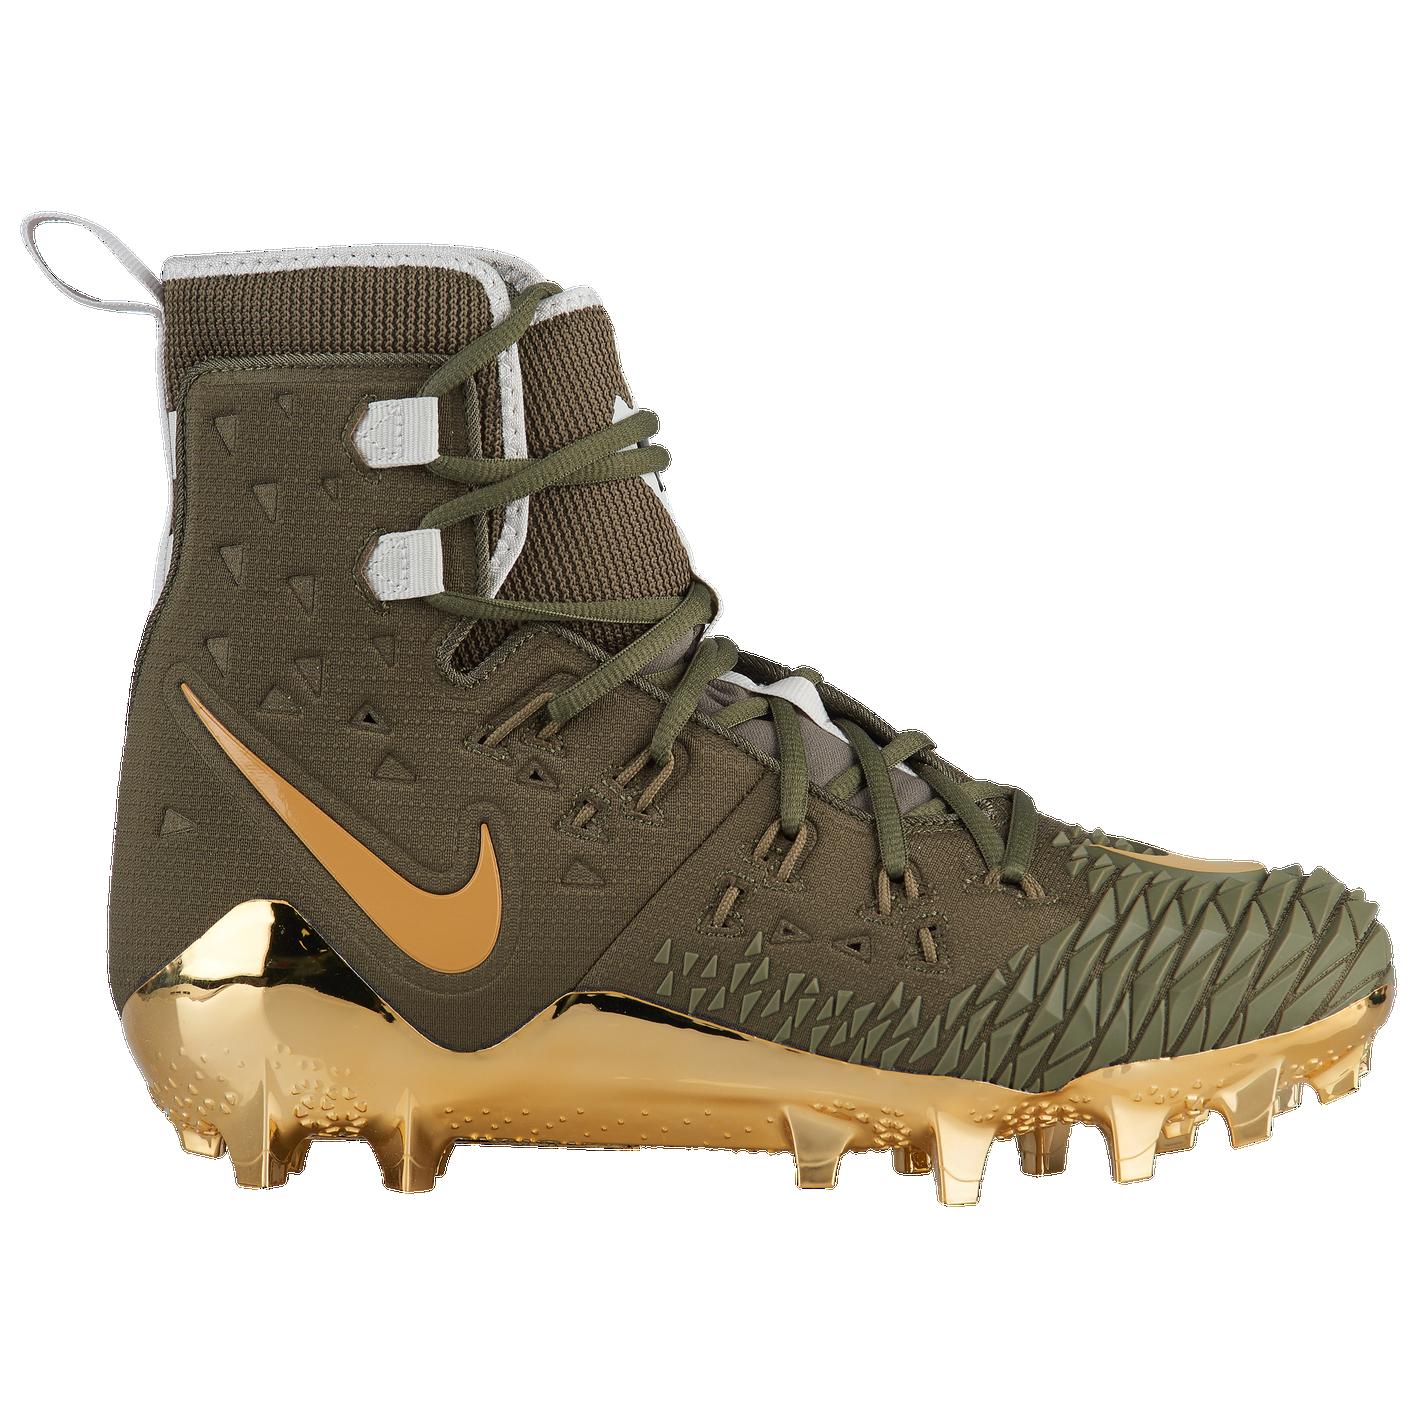 75c06477cb95 Nike Zoom Force Savage Elite TD - Men's - Football - Shoes - Olive ...